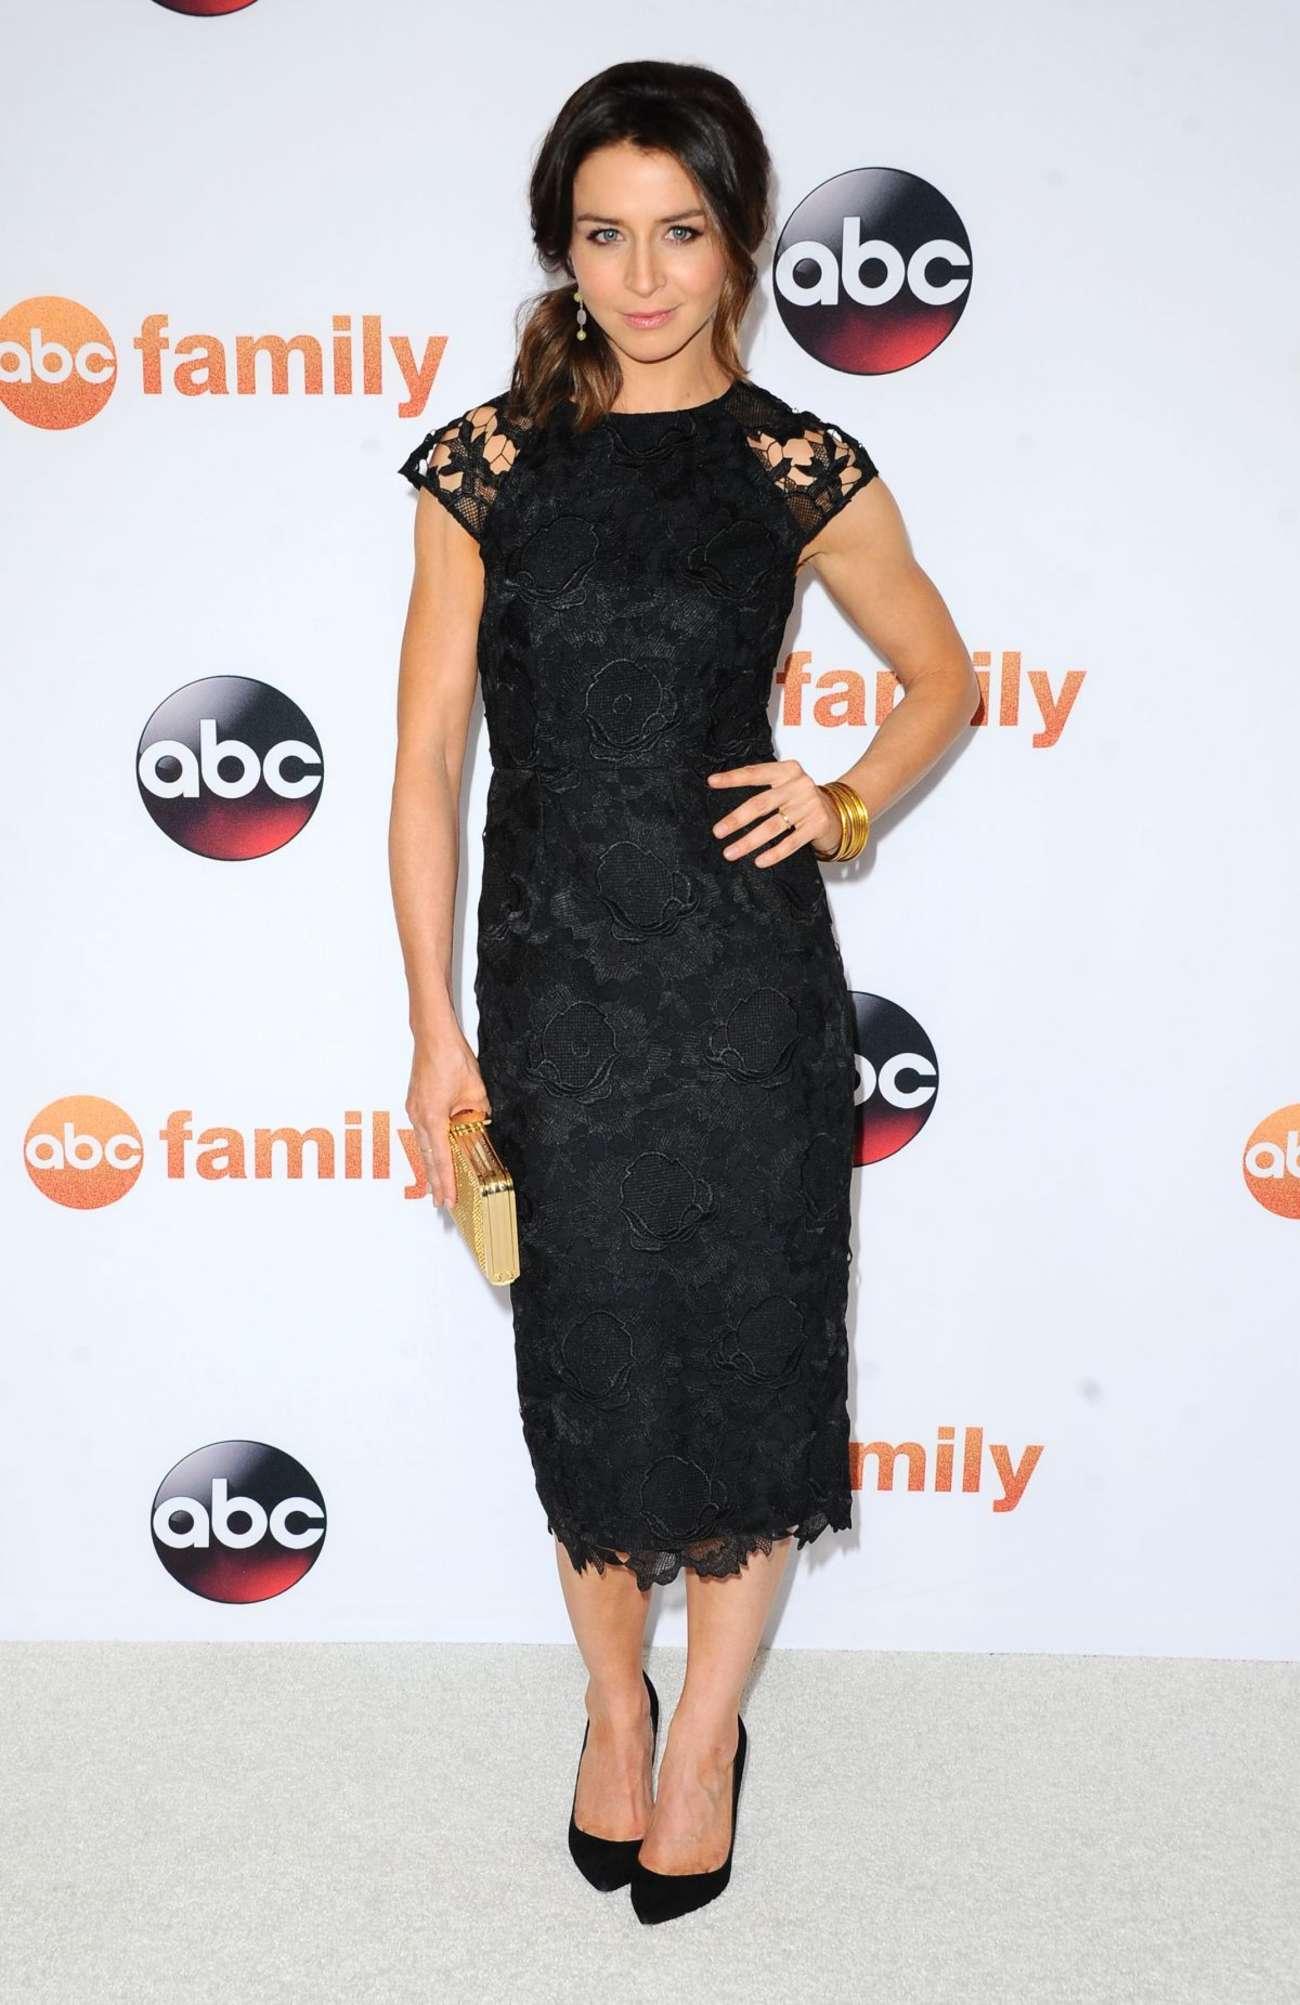 Caterina Scorsone Disney ABC Summer TCA Press Tour Photo Call in Beverly Hills